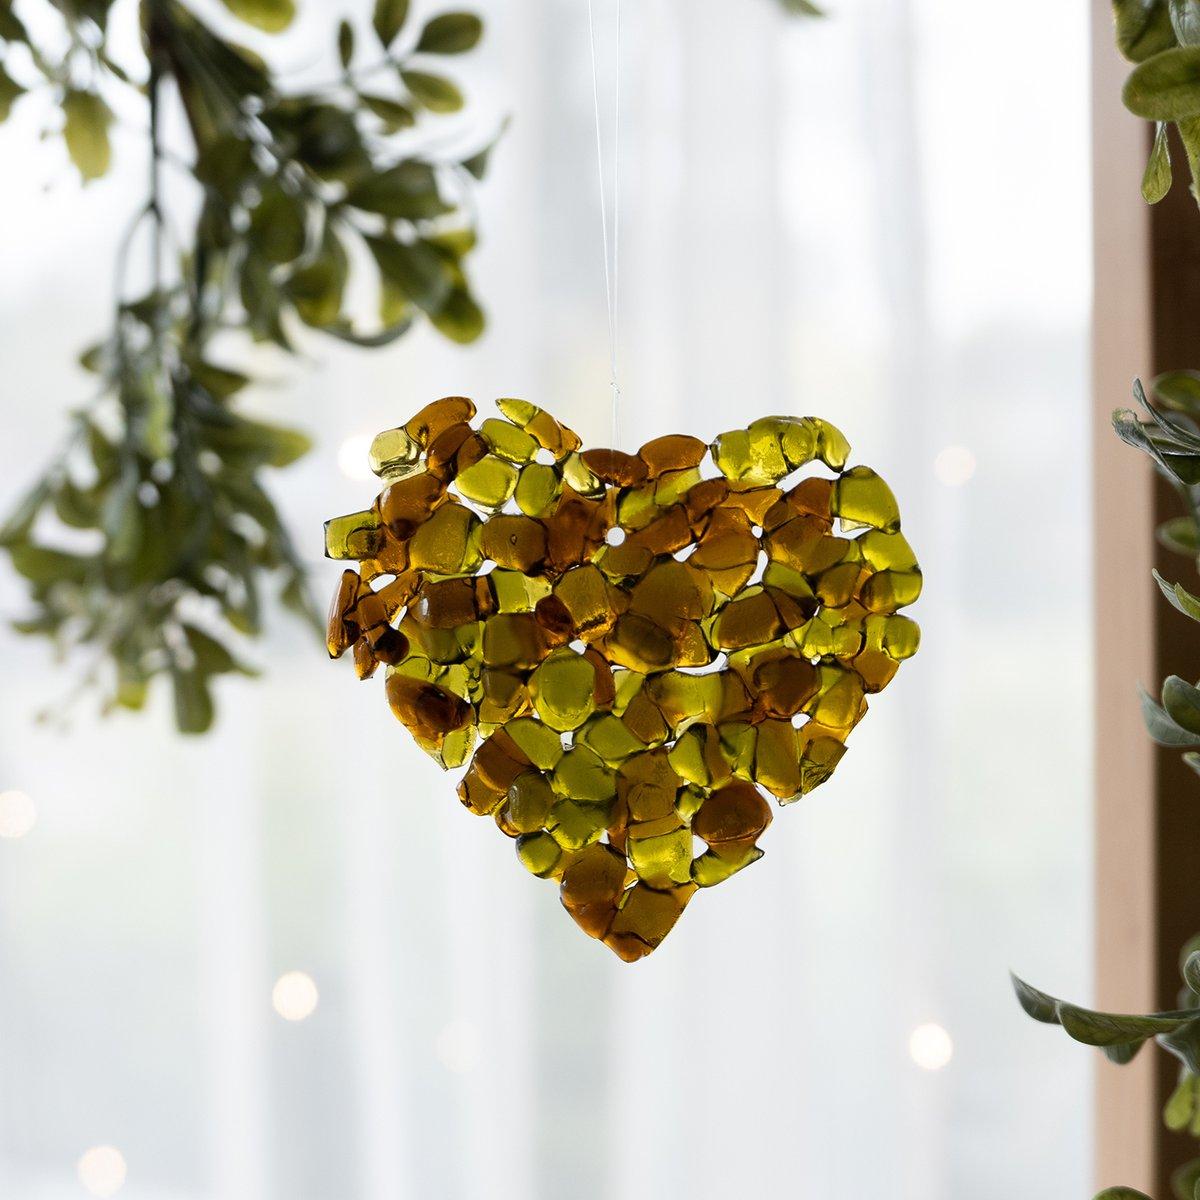 I have been thinking what else I could make out of wine bottle glass... 💚 #handmademagic #xmaslove #xmasornament #xmasdecoration #xmasgift #smallbusiness #supportlocal #supportsmallbusiness #zerowaste #ecofriendly #ecogift #giftidea #ecofriendly #ecogift #reducereuserecycle https://t.co/LX0RGtxc7O